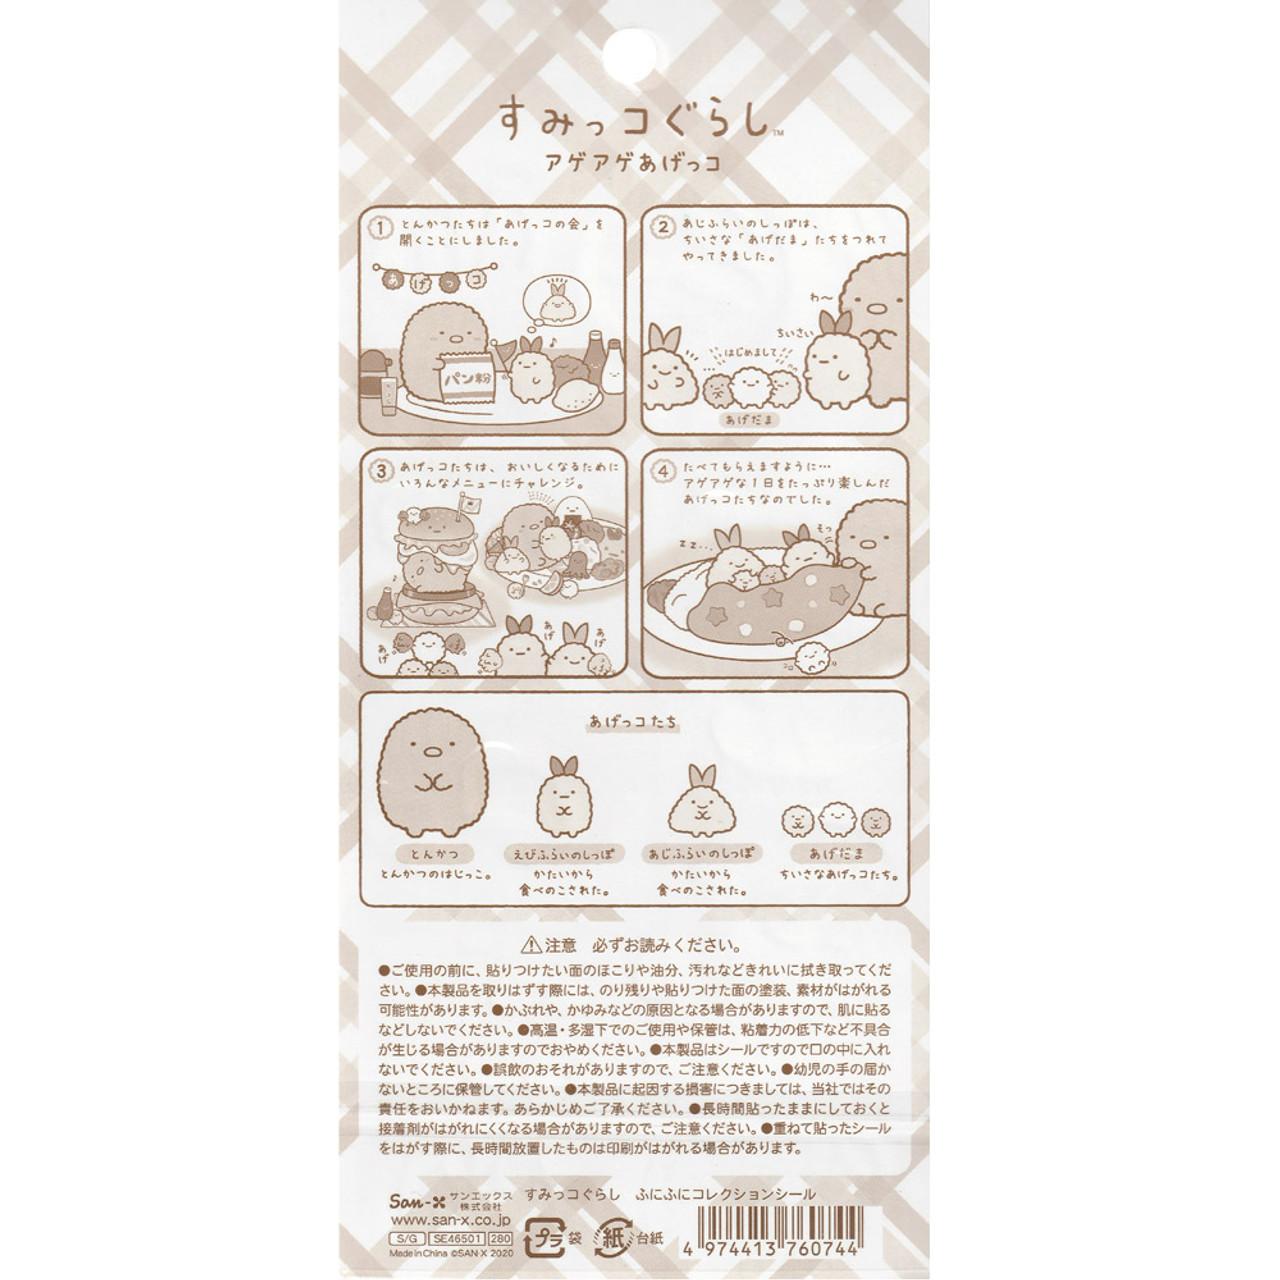 Sumikko Gurashi Funny Collection Sticker SE46501 - Eat ( Back View )